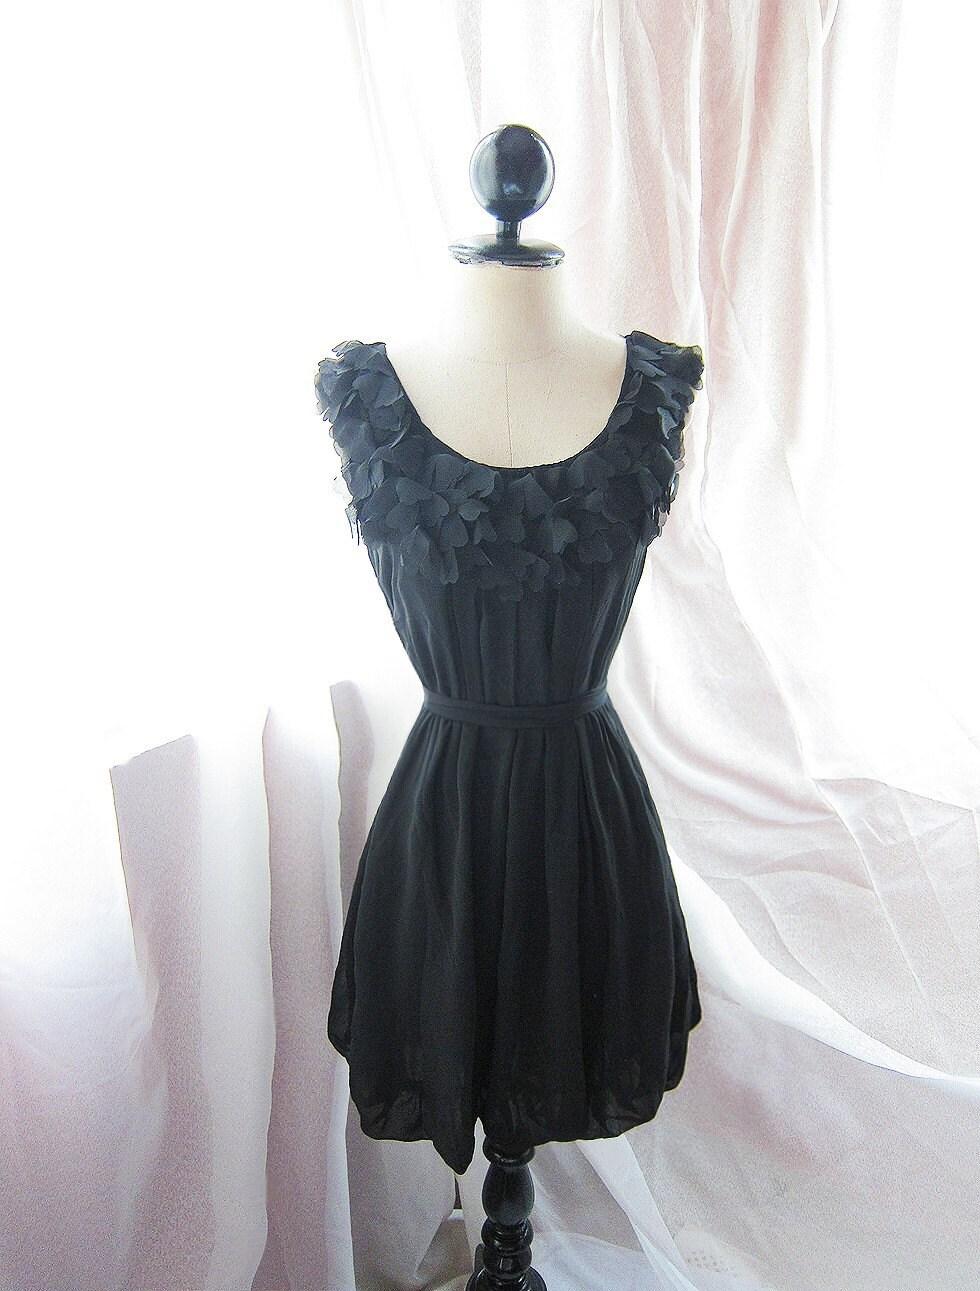 Classic Dreamy Romantic Havisham Mille Feuille Heart Cutouts Chiffon FlowyTwilight Little Black Dress